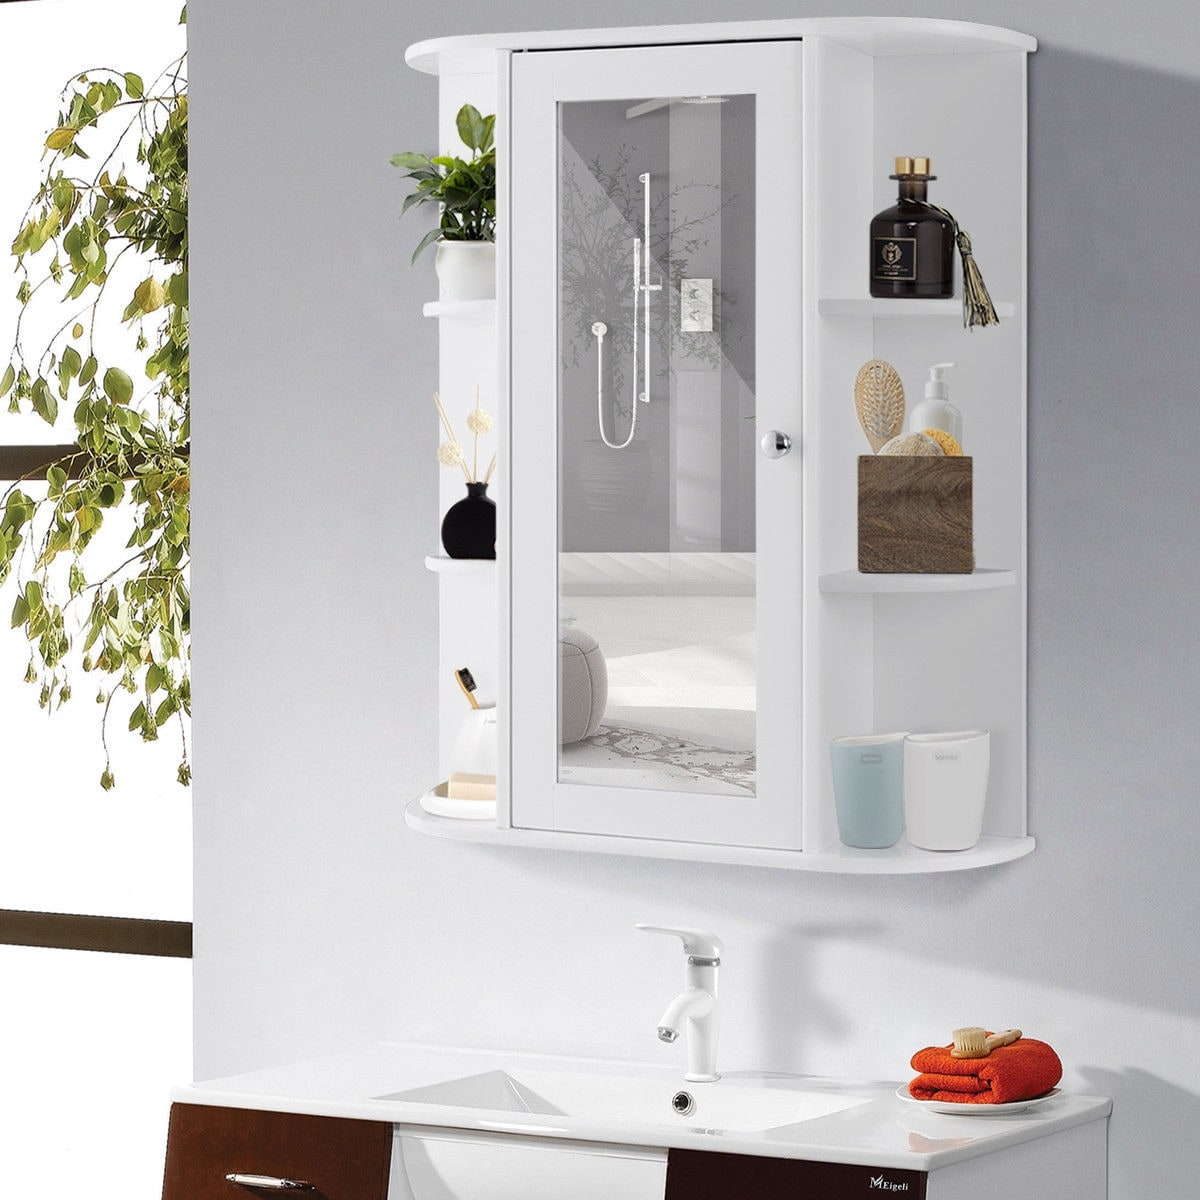 Gymax Bathroom Cabinet Single Door Shelves Wall Mount Cabinet W On Sale Overstock 22985062